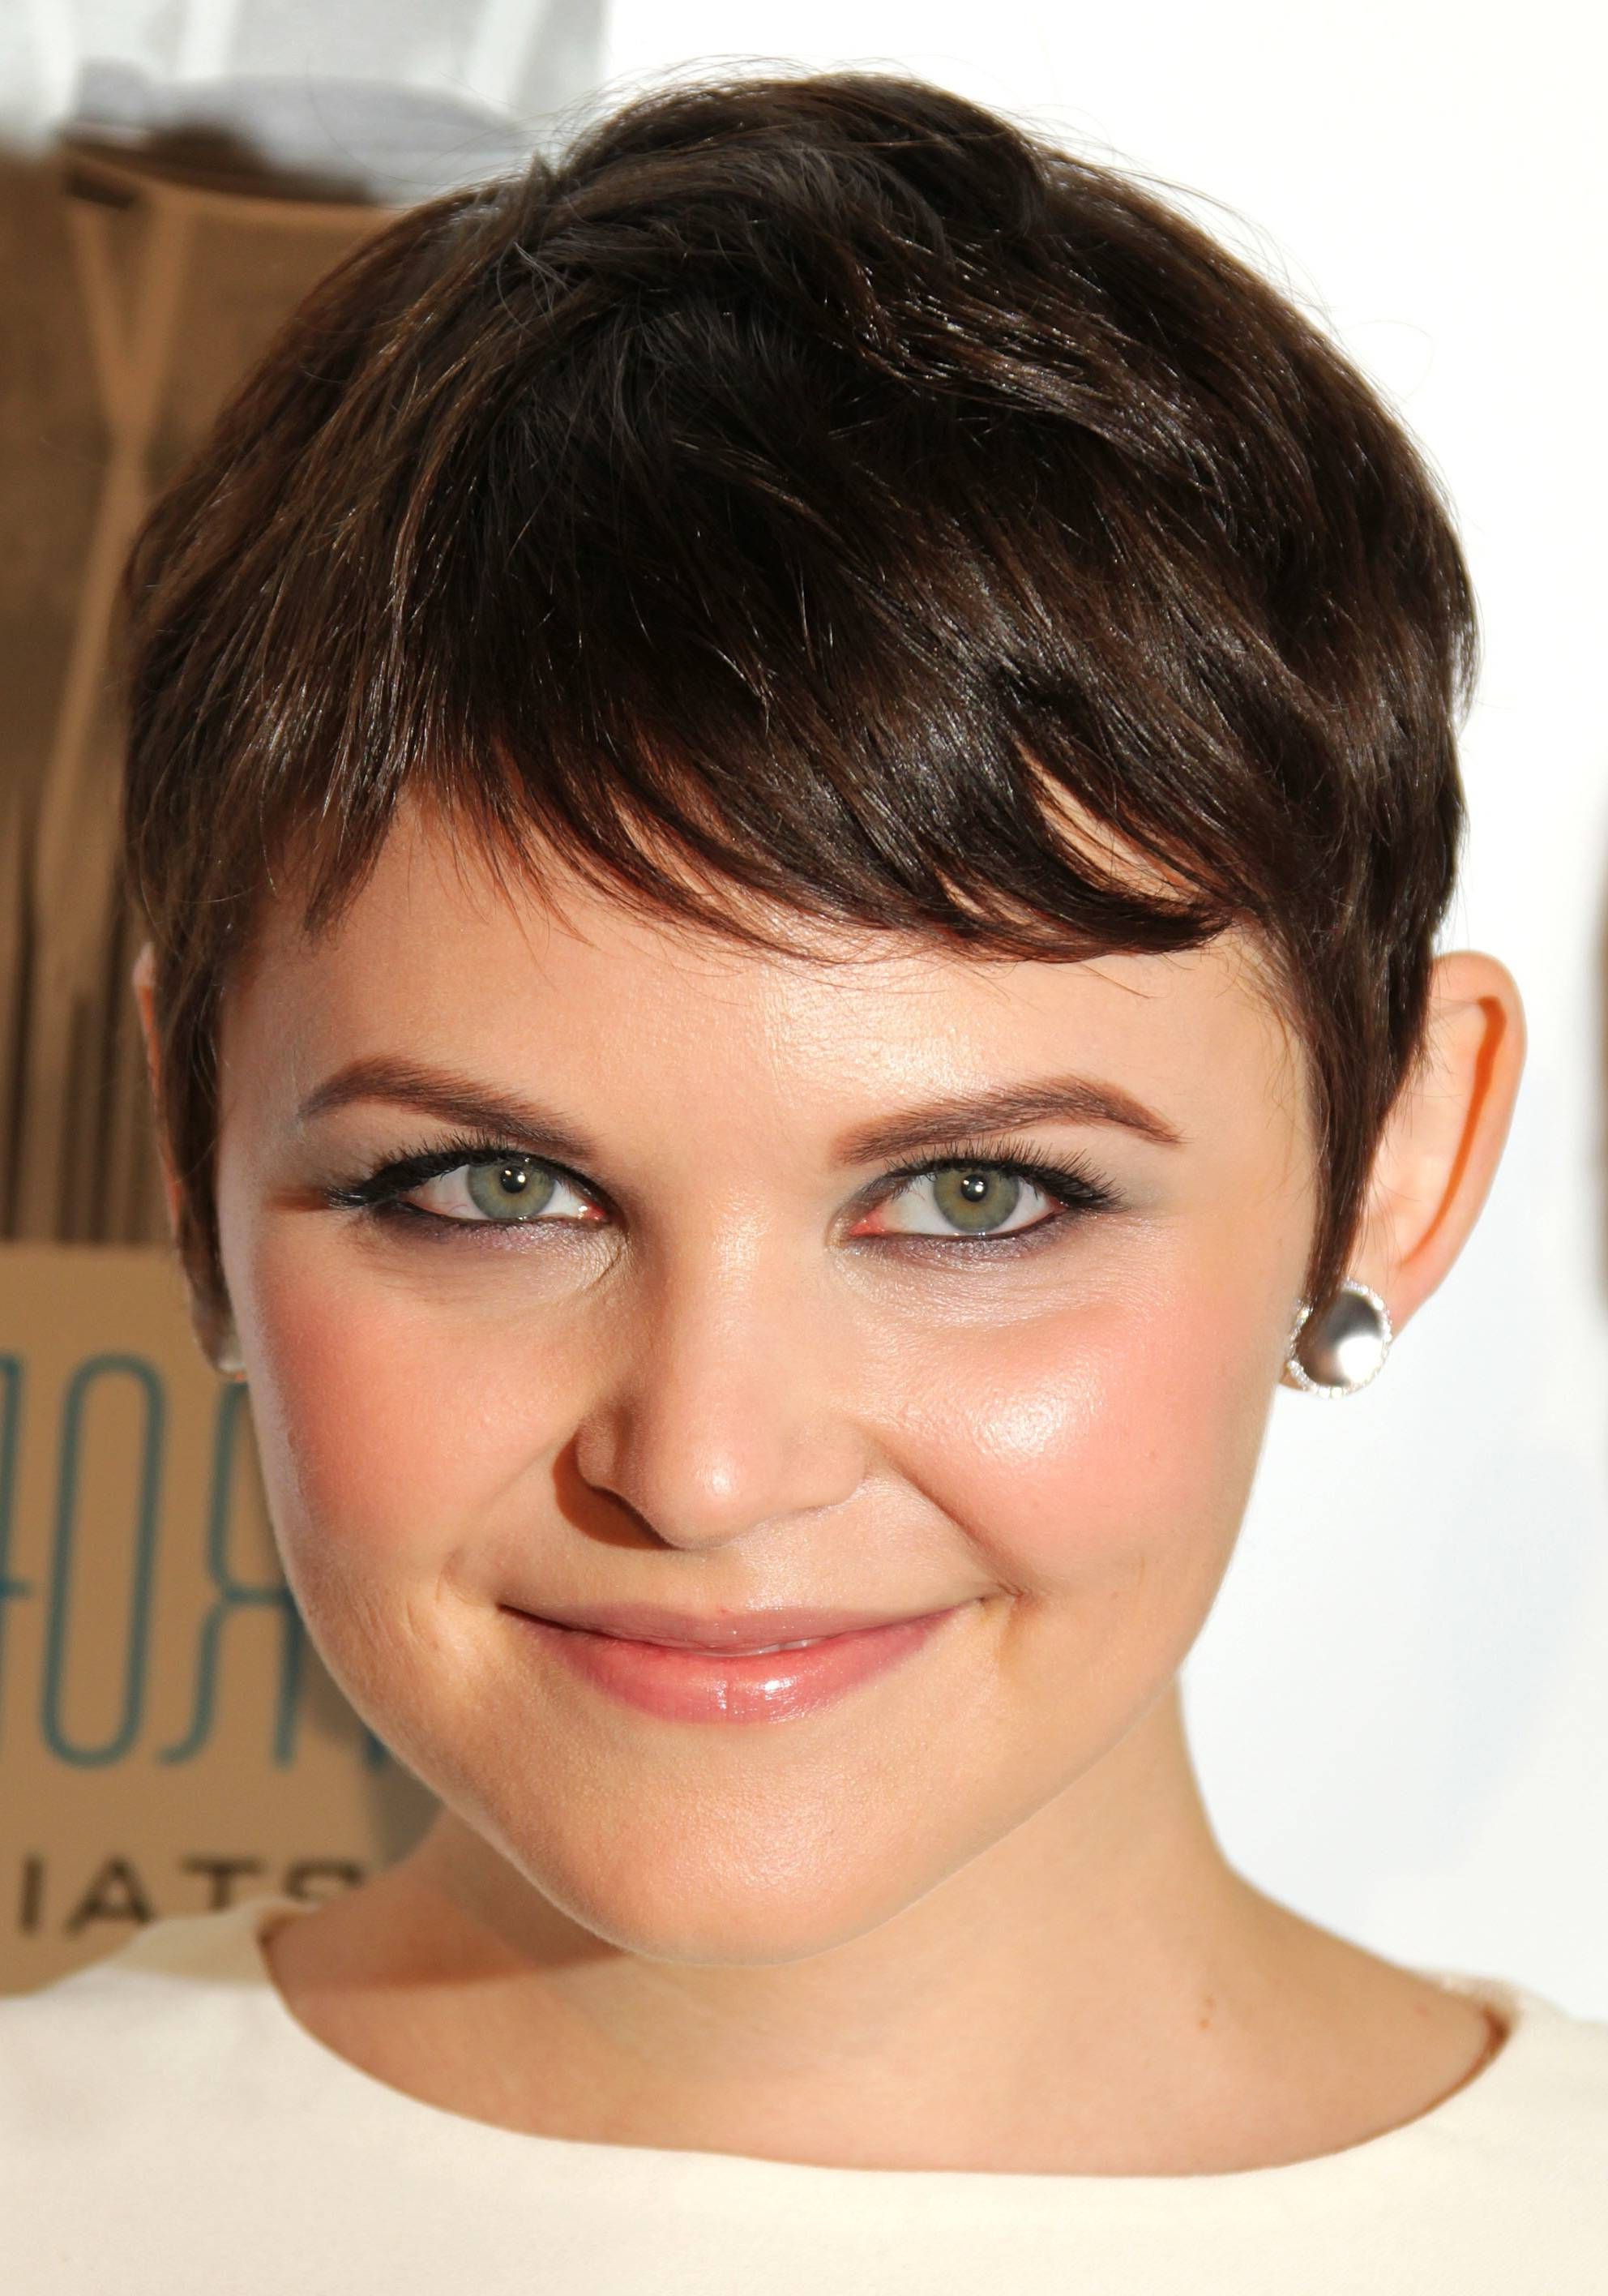 Fun, Edgy, Feminine Short Hairstyles / Haircuts That Rock!! – Pixie Intended For Feminine Short Haircuts (View 10 of 25)